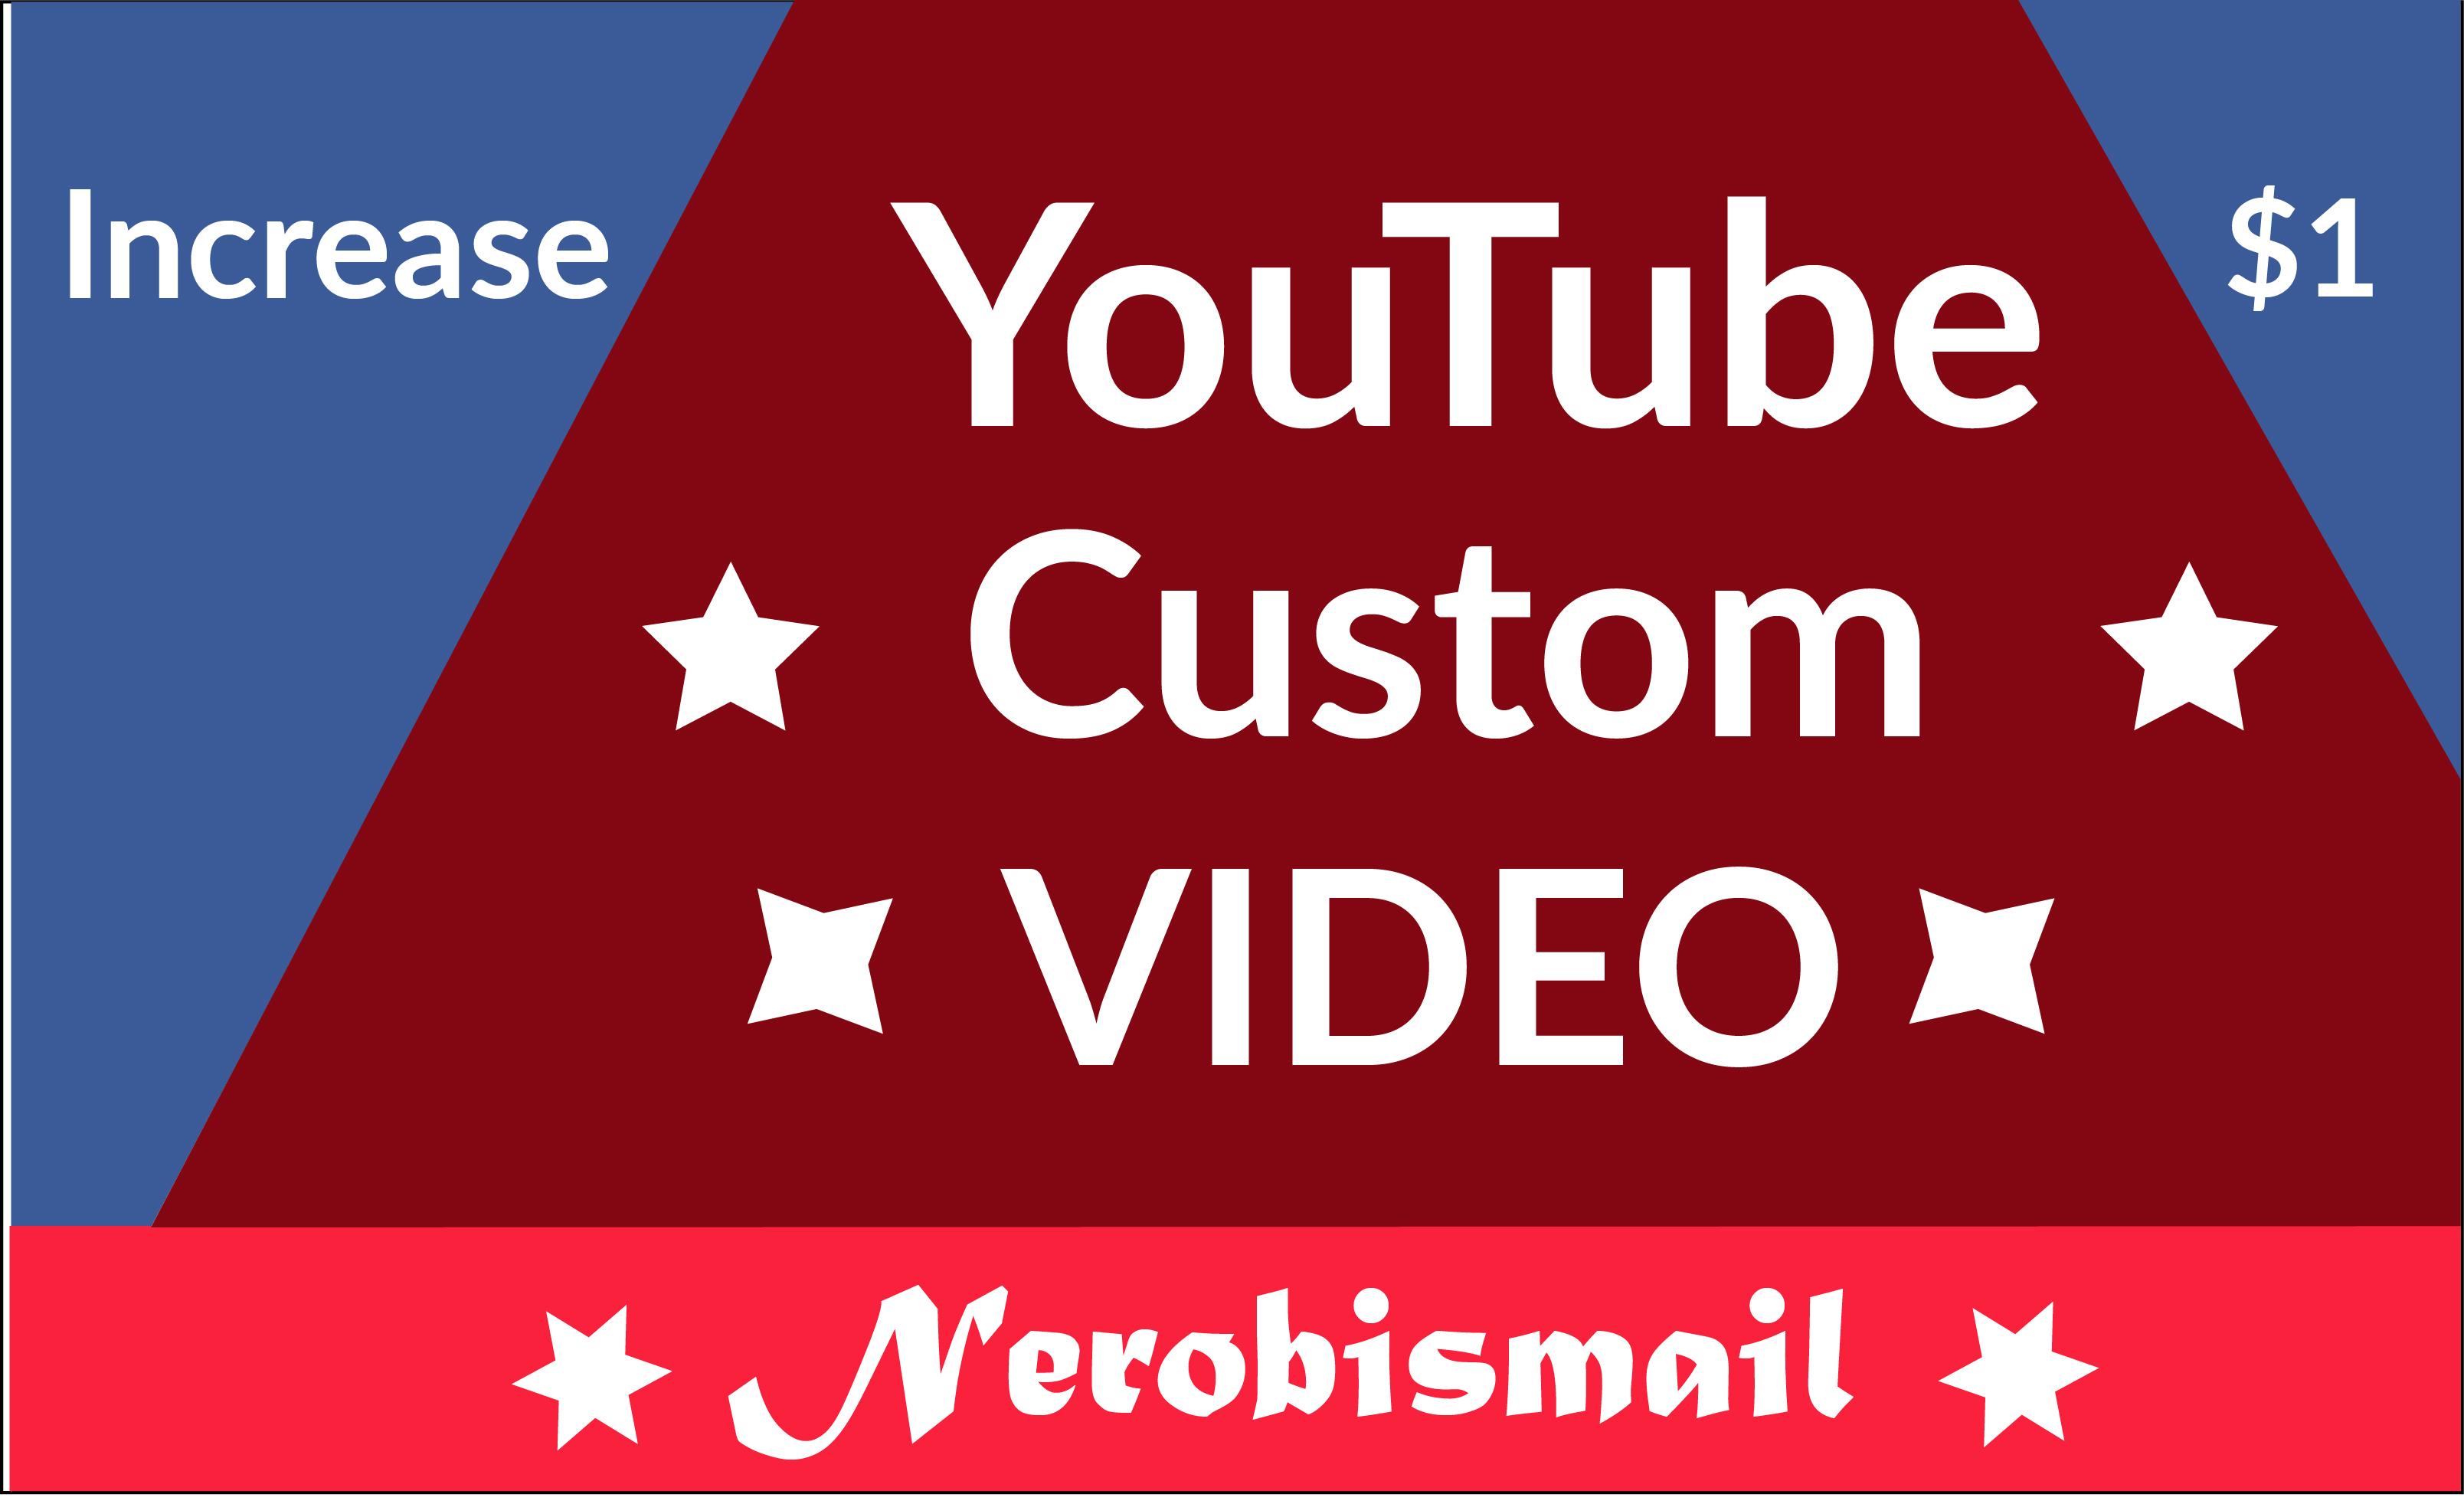 Increase HQ profile custom YouTube videos Promotion world user